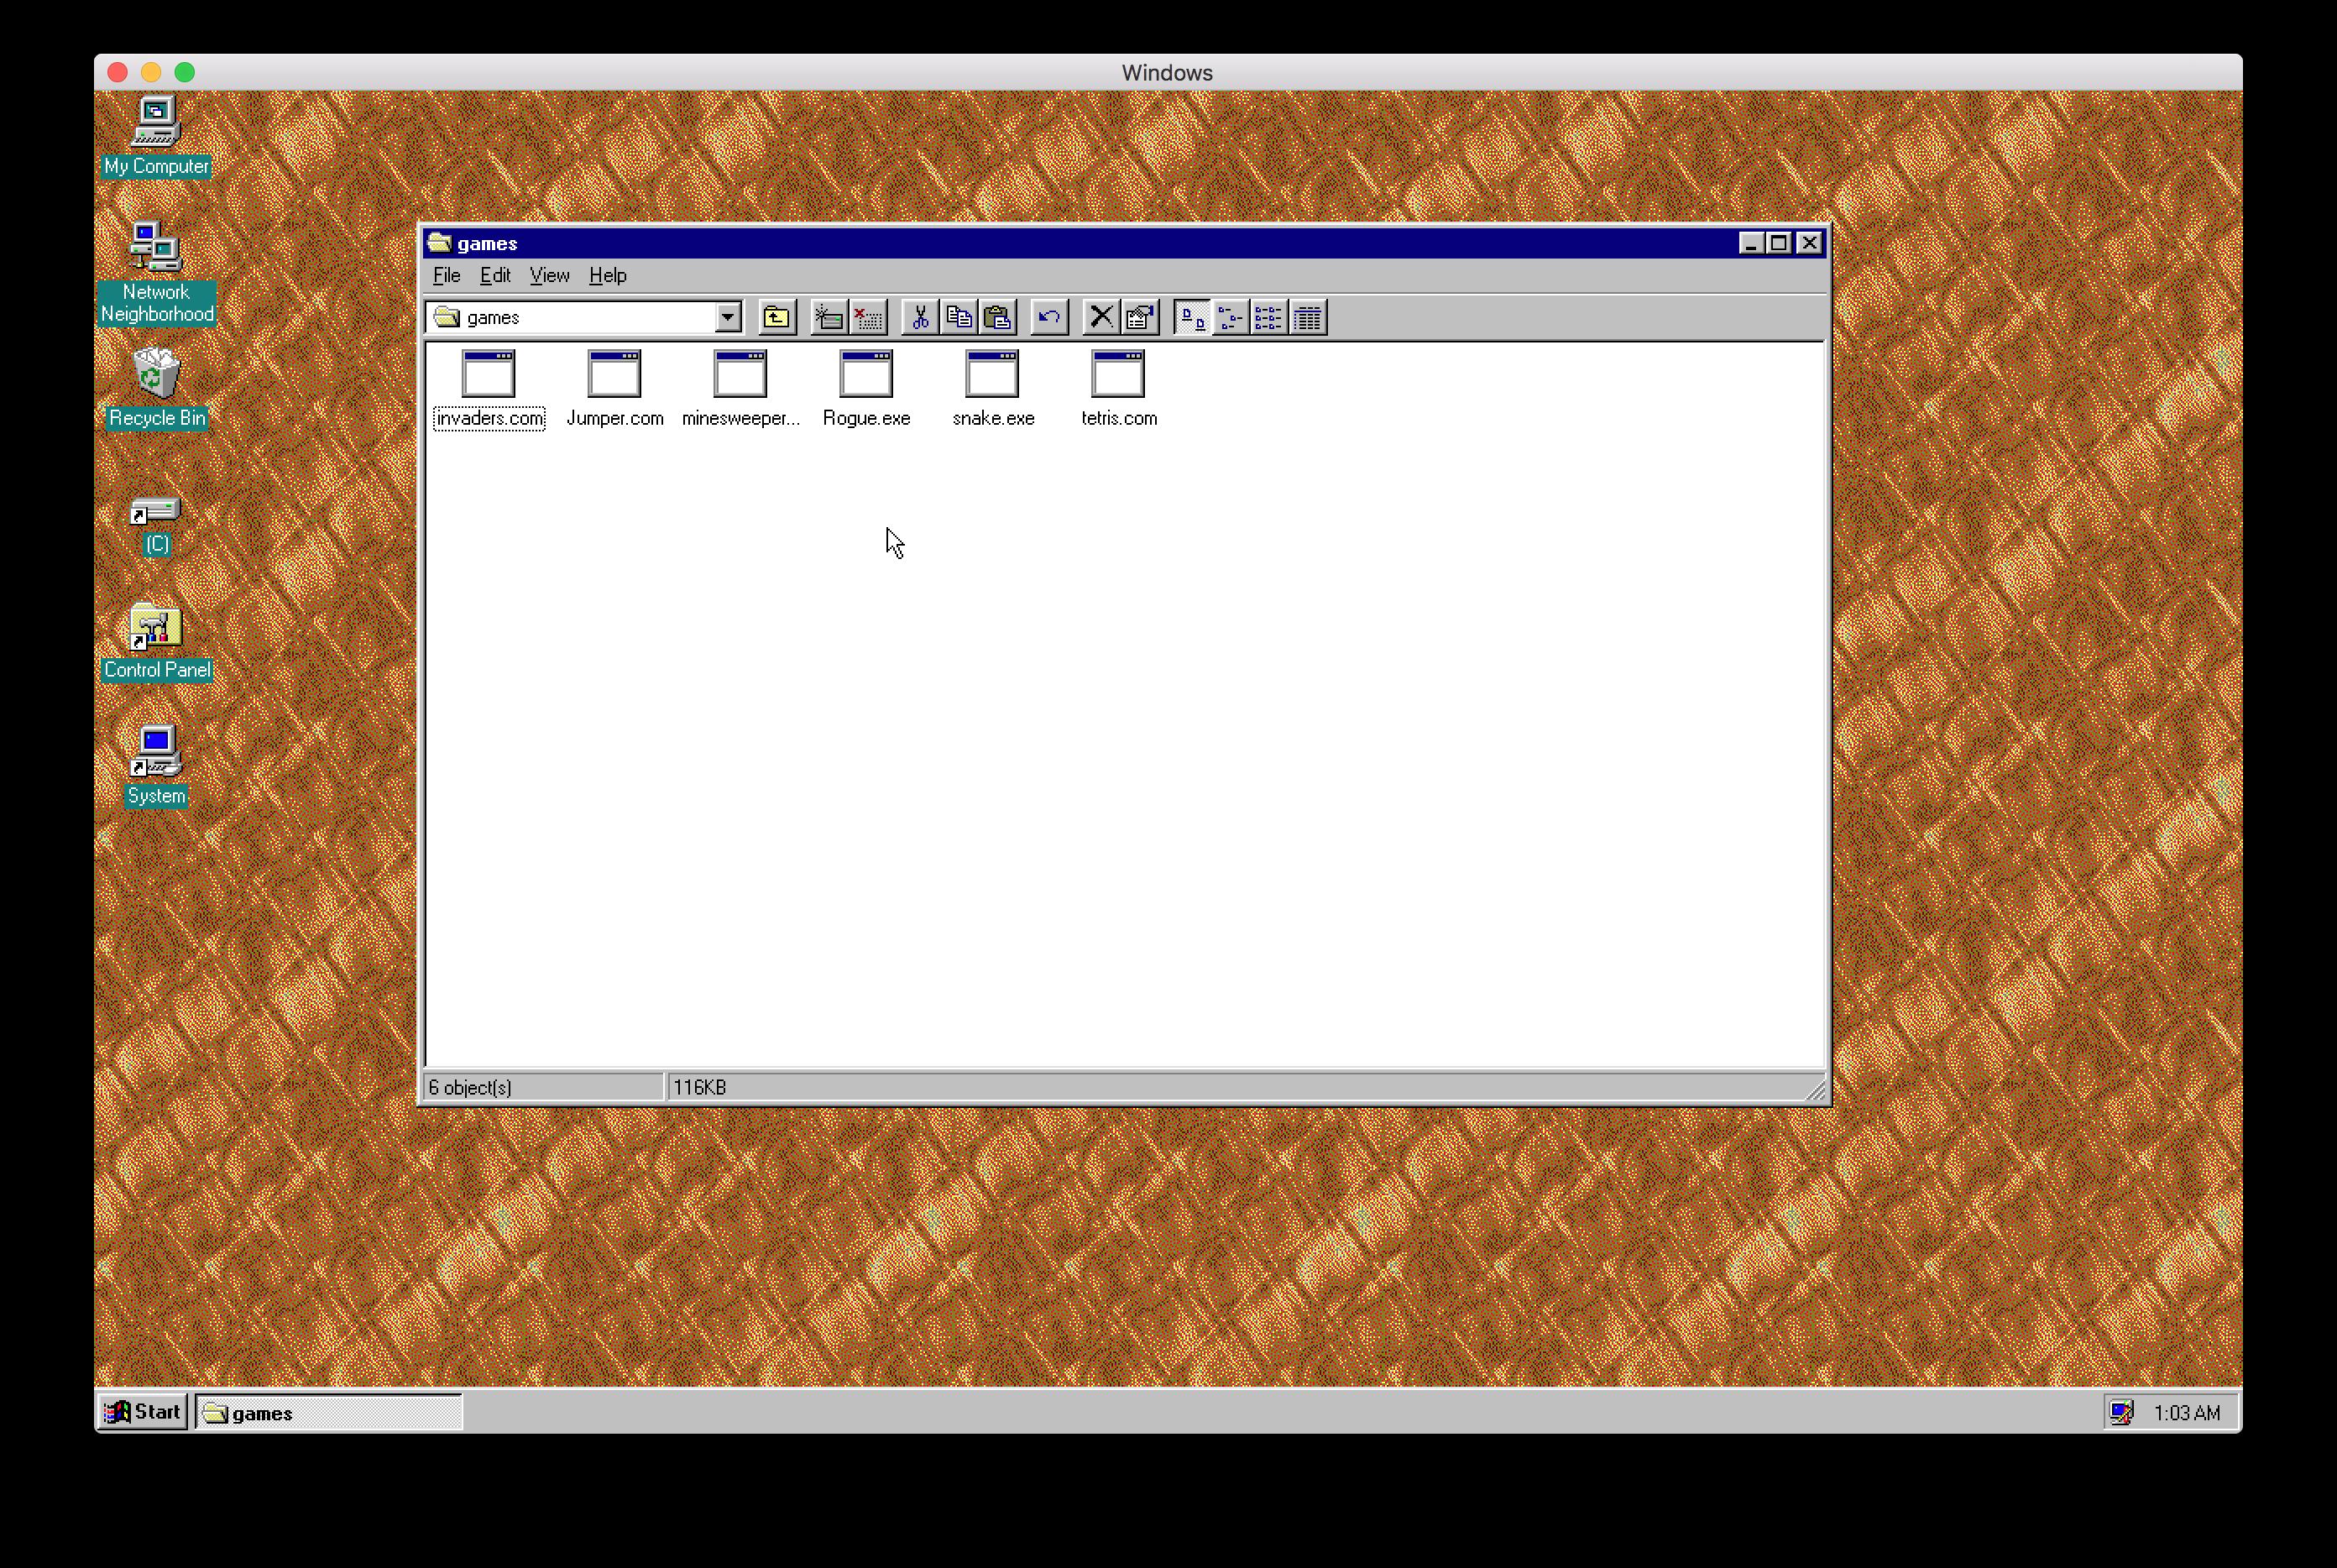 How you can run Windows 95 on Mac, Windows or Linux